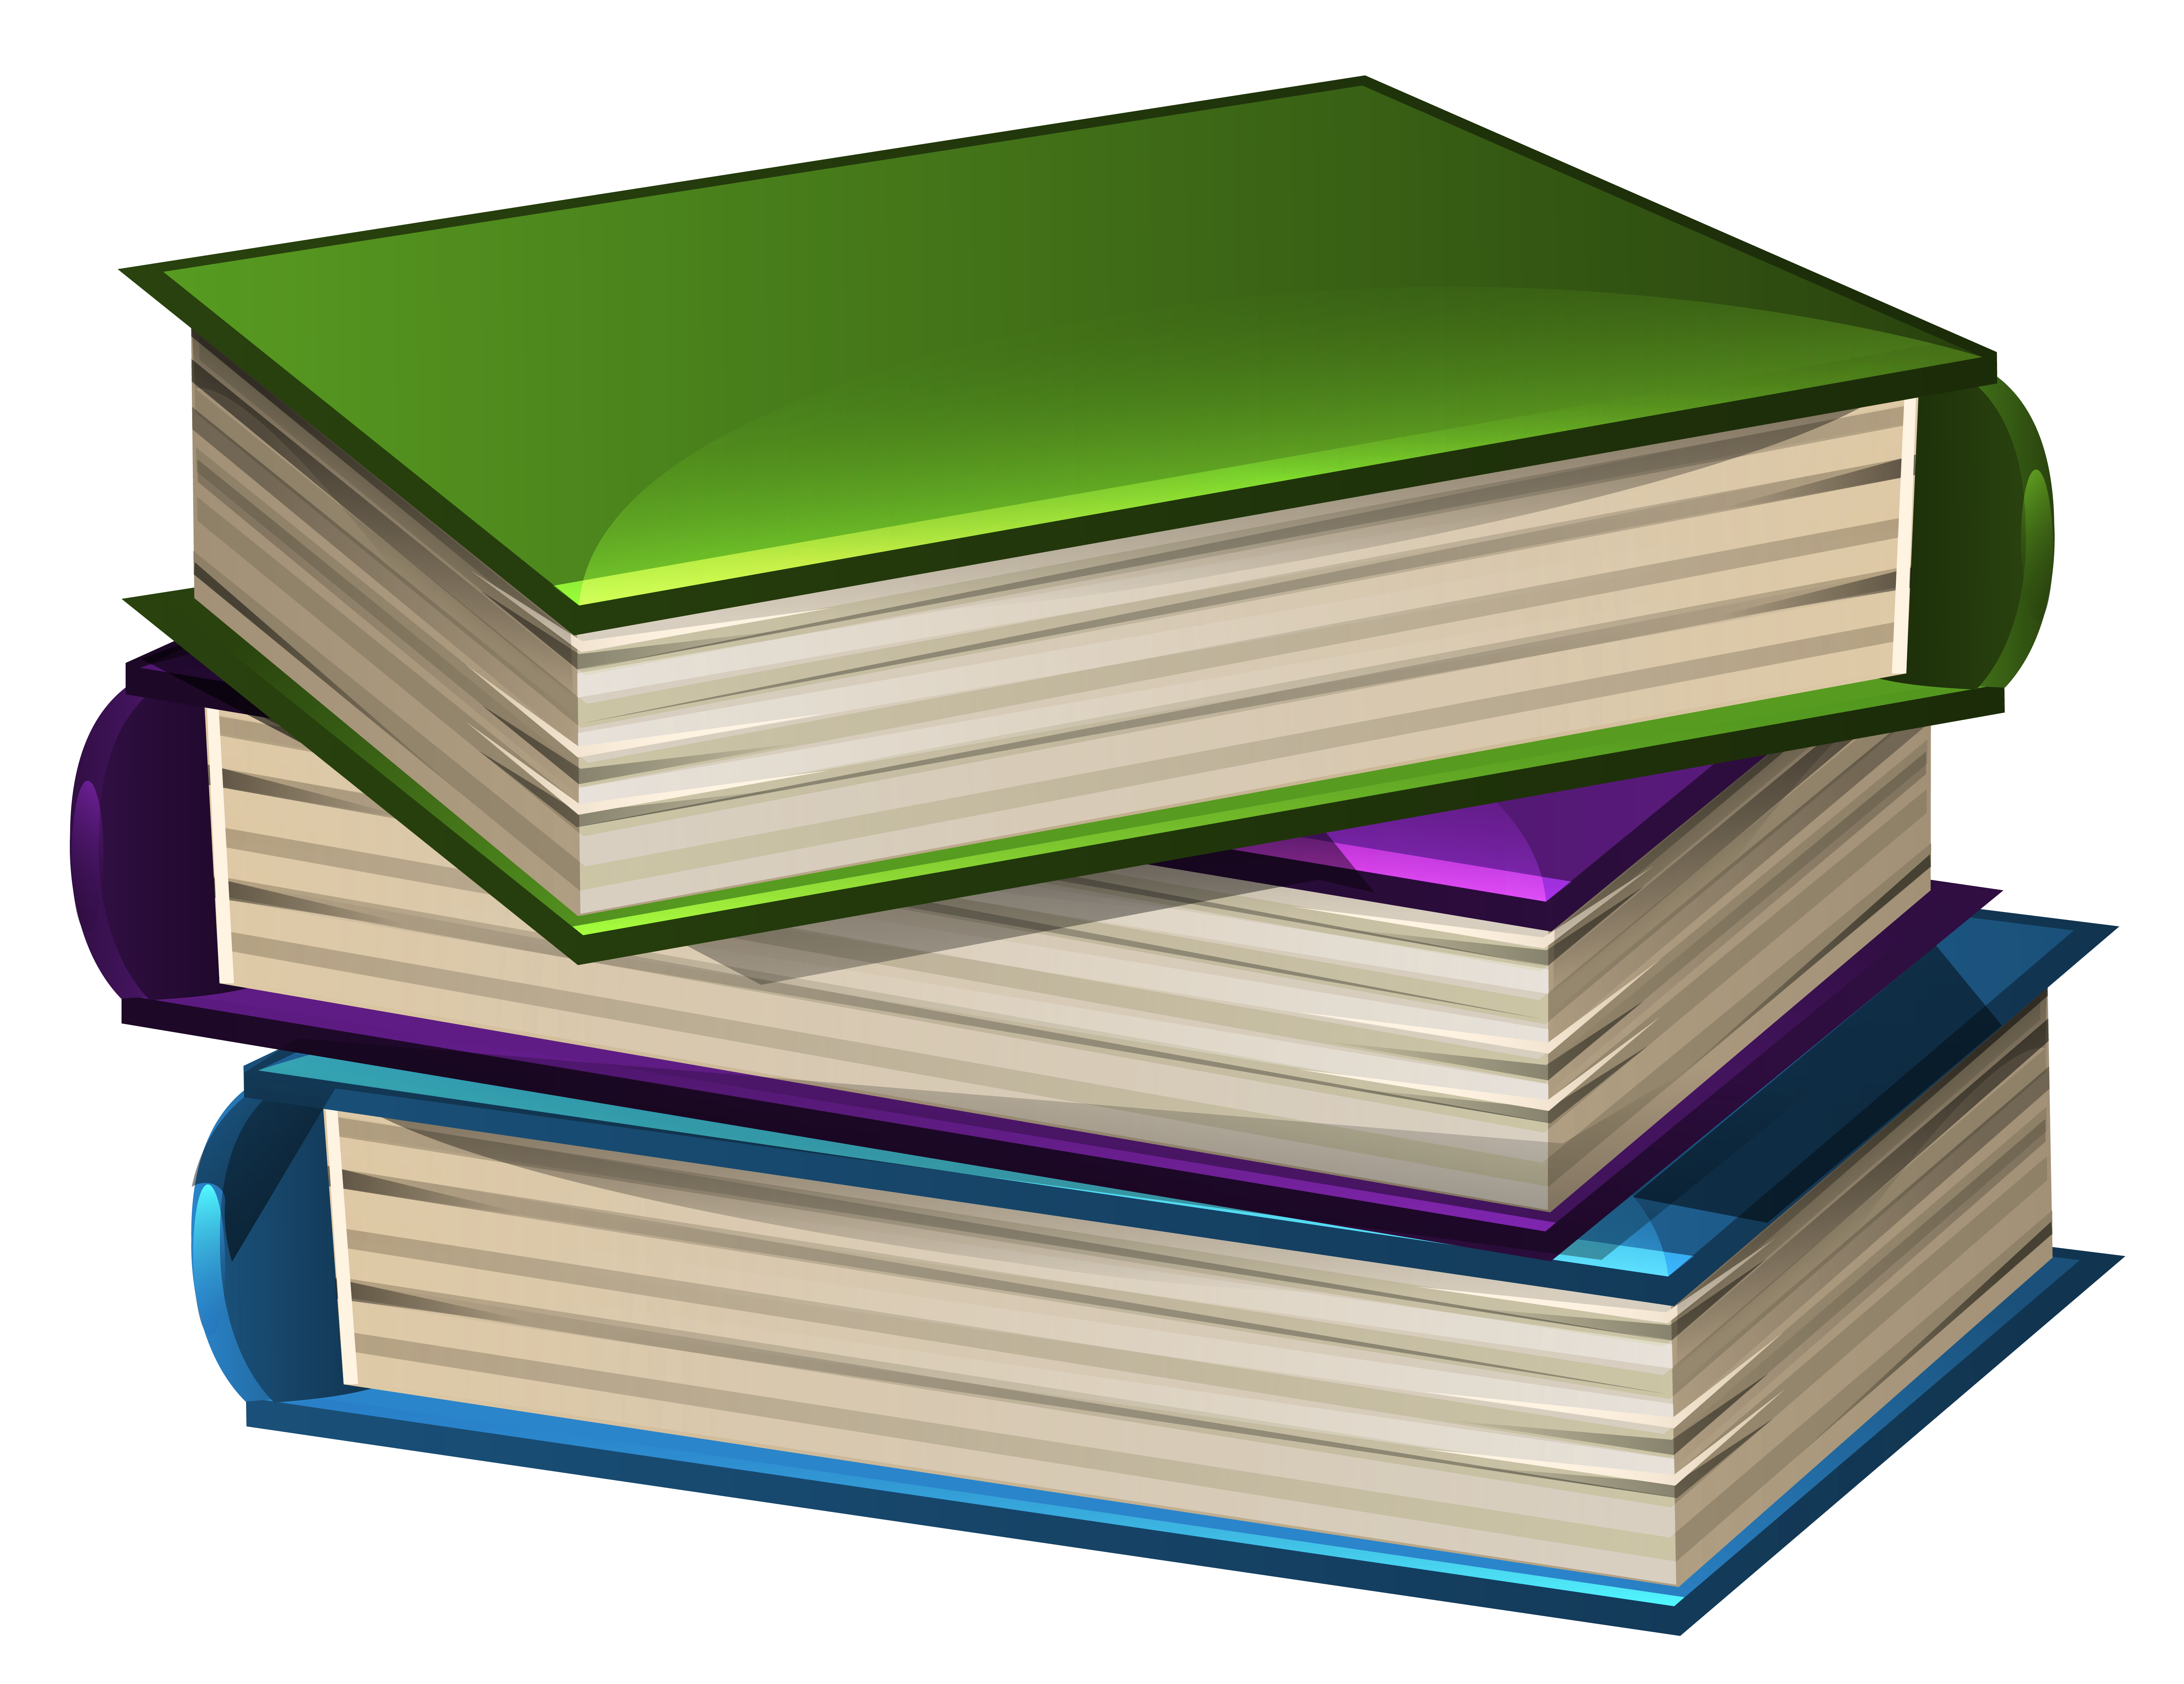 School book at getdrawings. Textbook clipart teacher